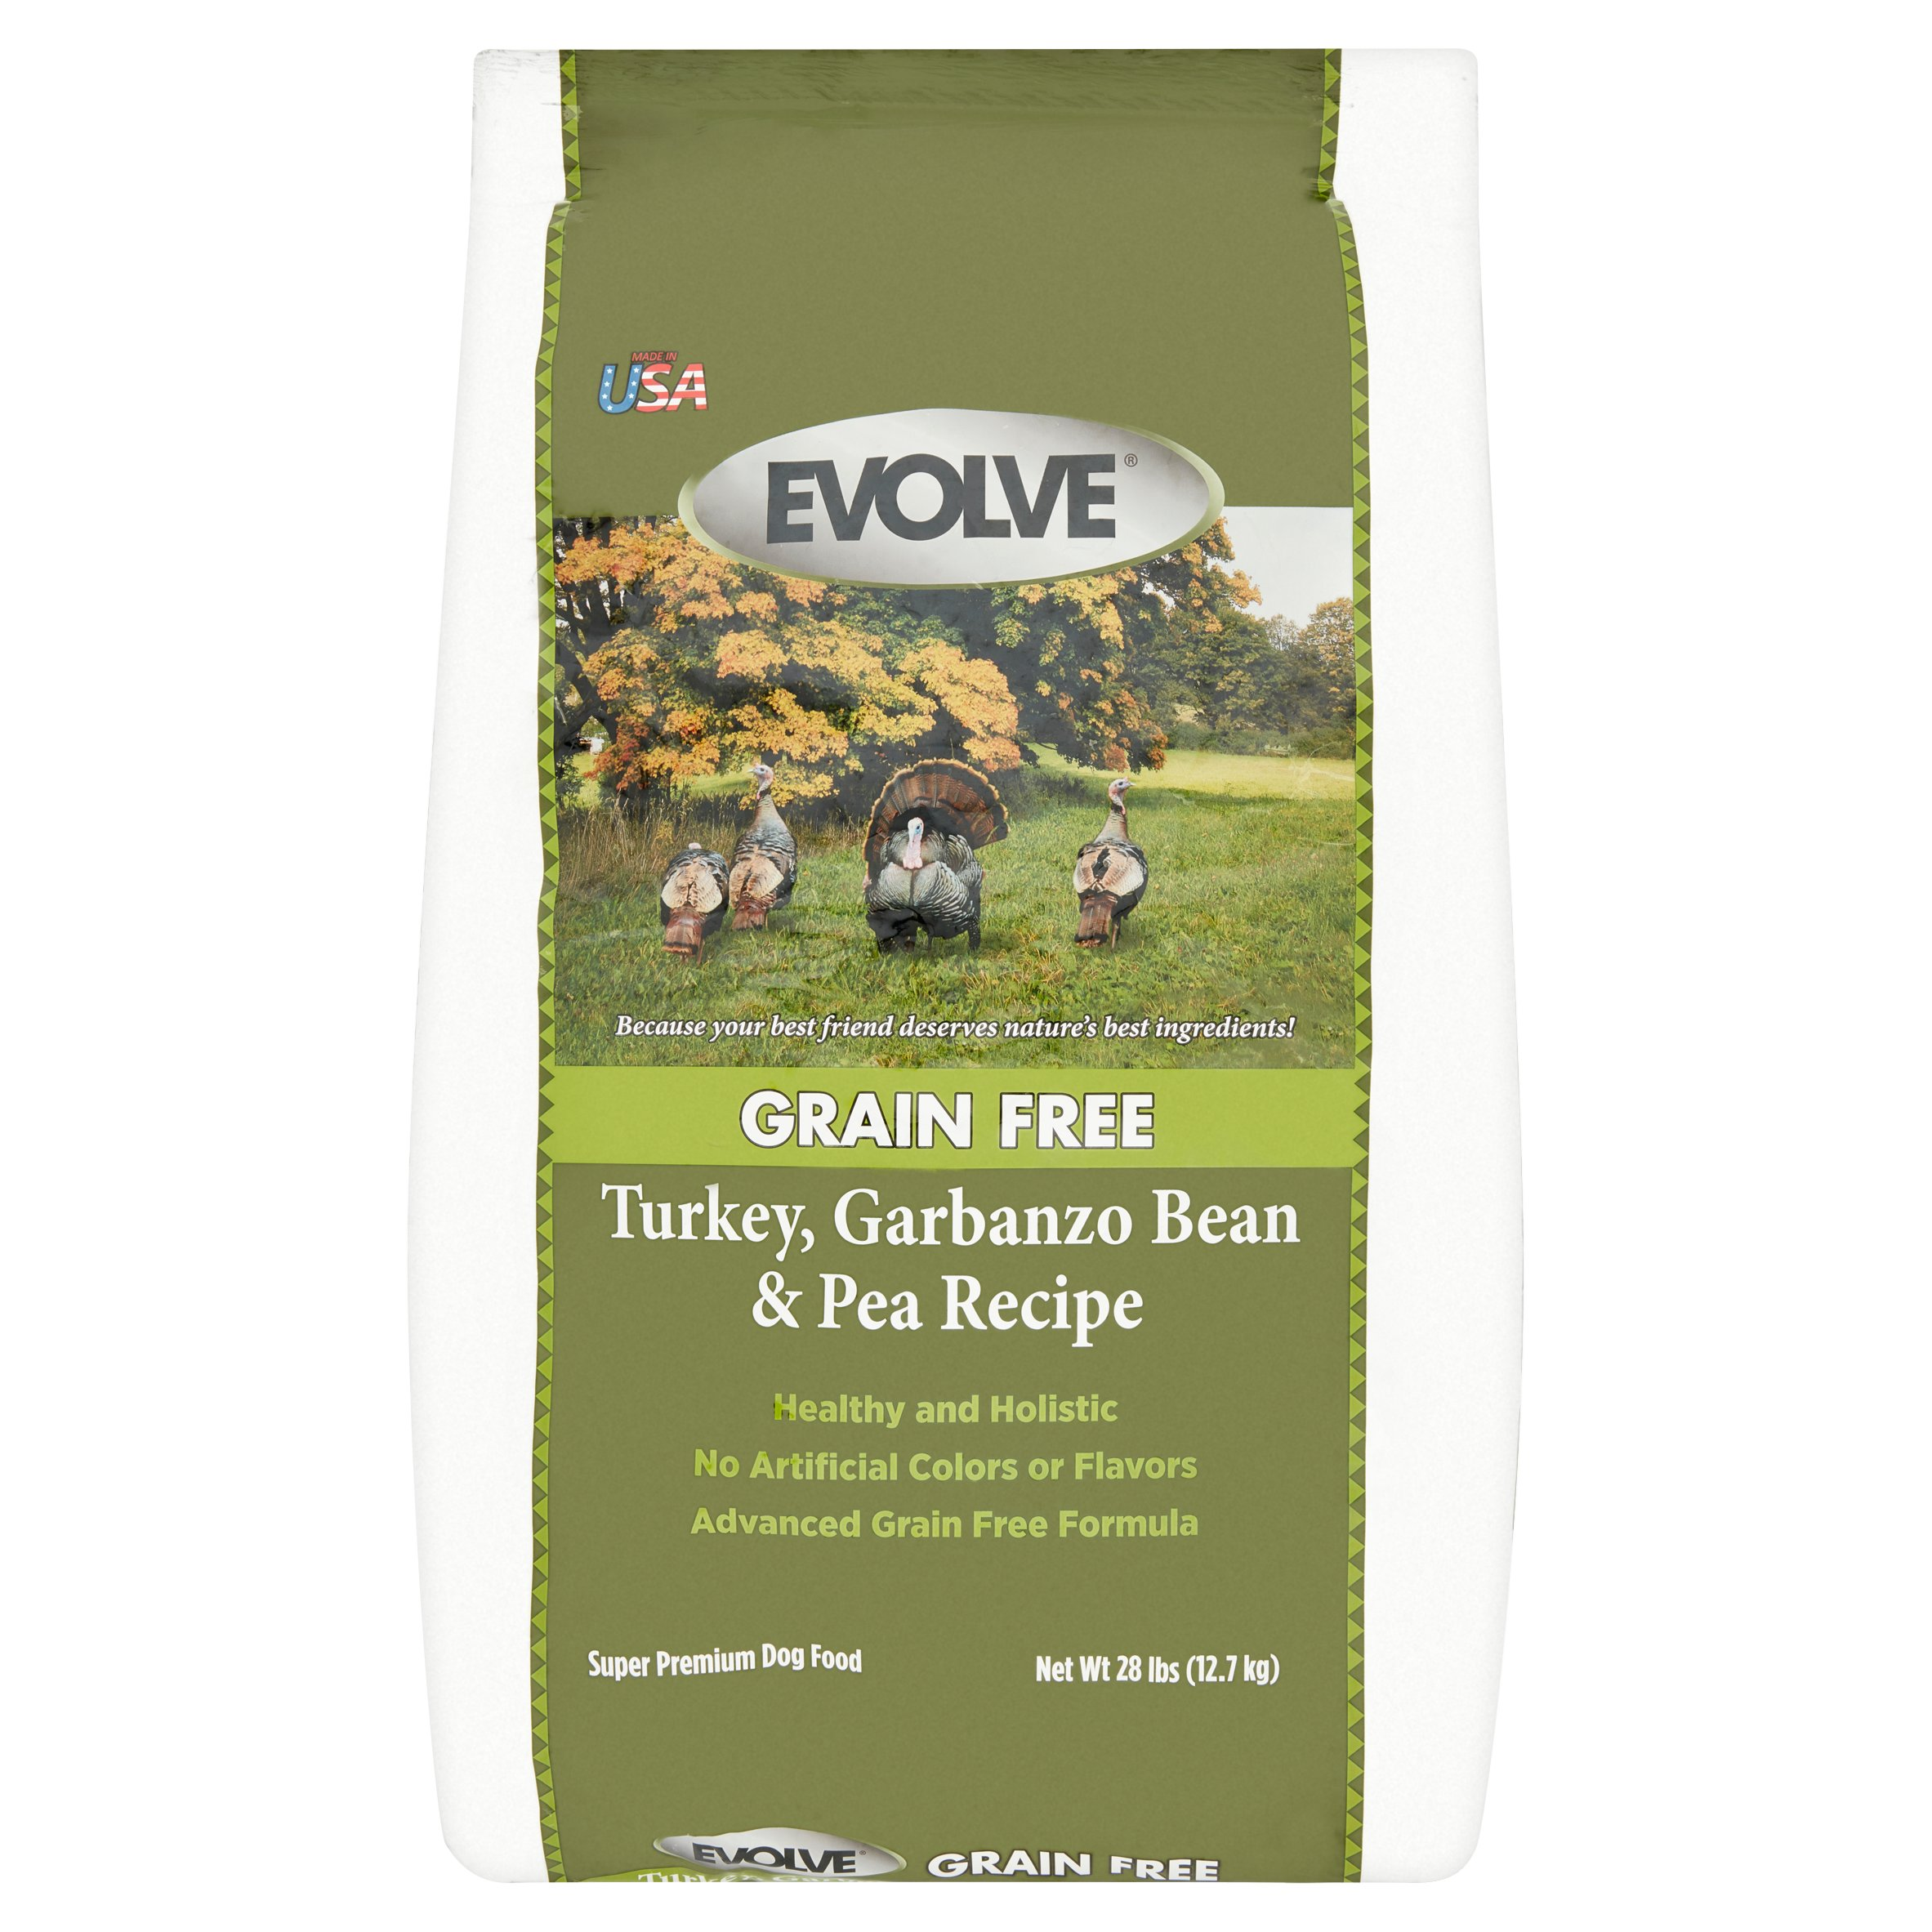 Evolve Grain Free Turkey, Garbanzo Bean & Pea Recipe Super Premium Dog Food, 28 lbs